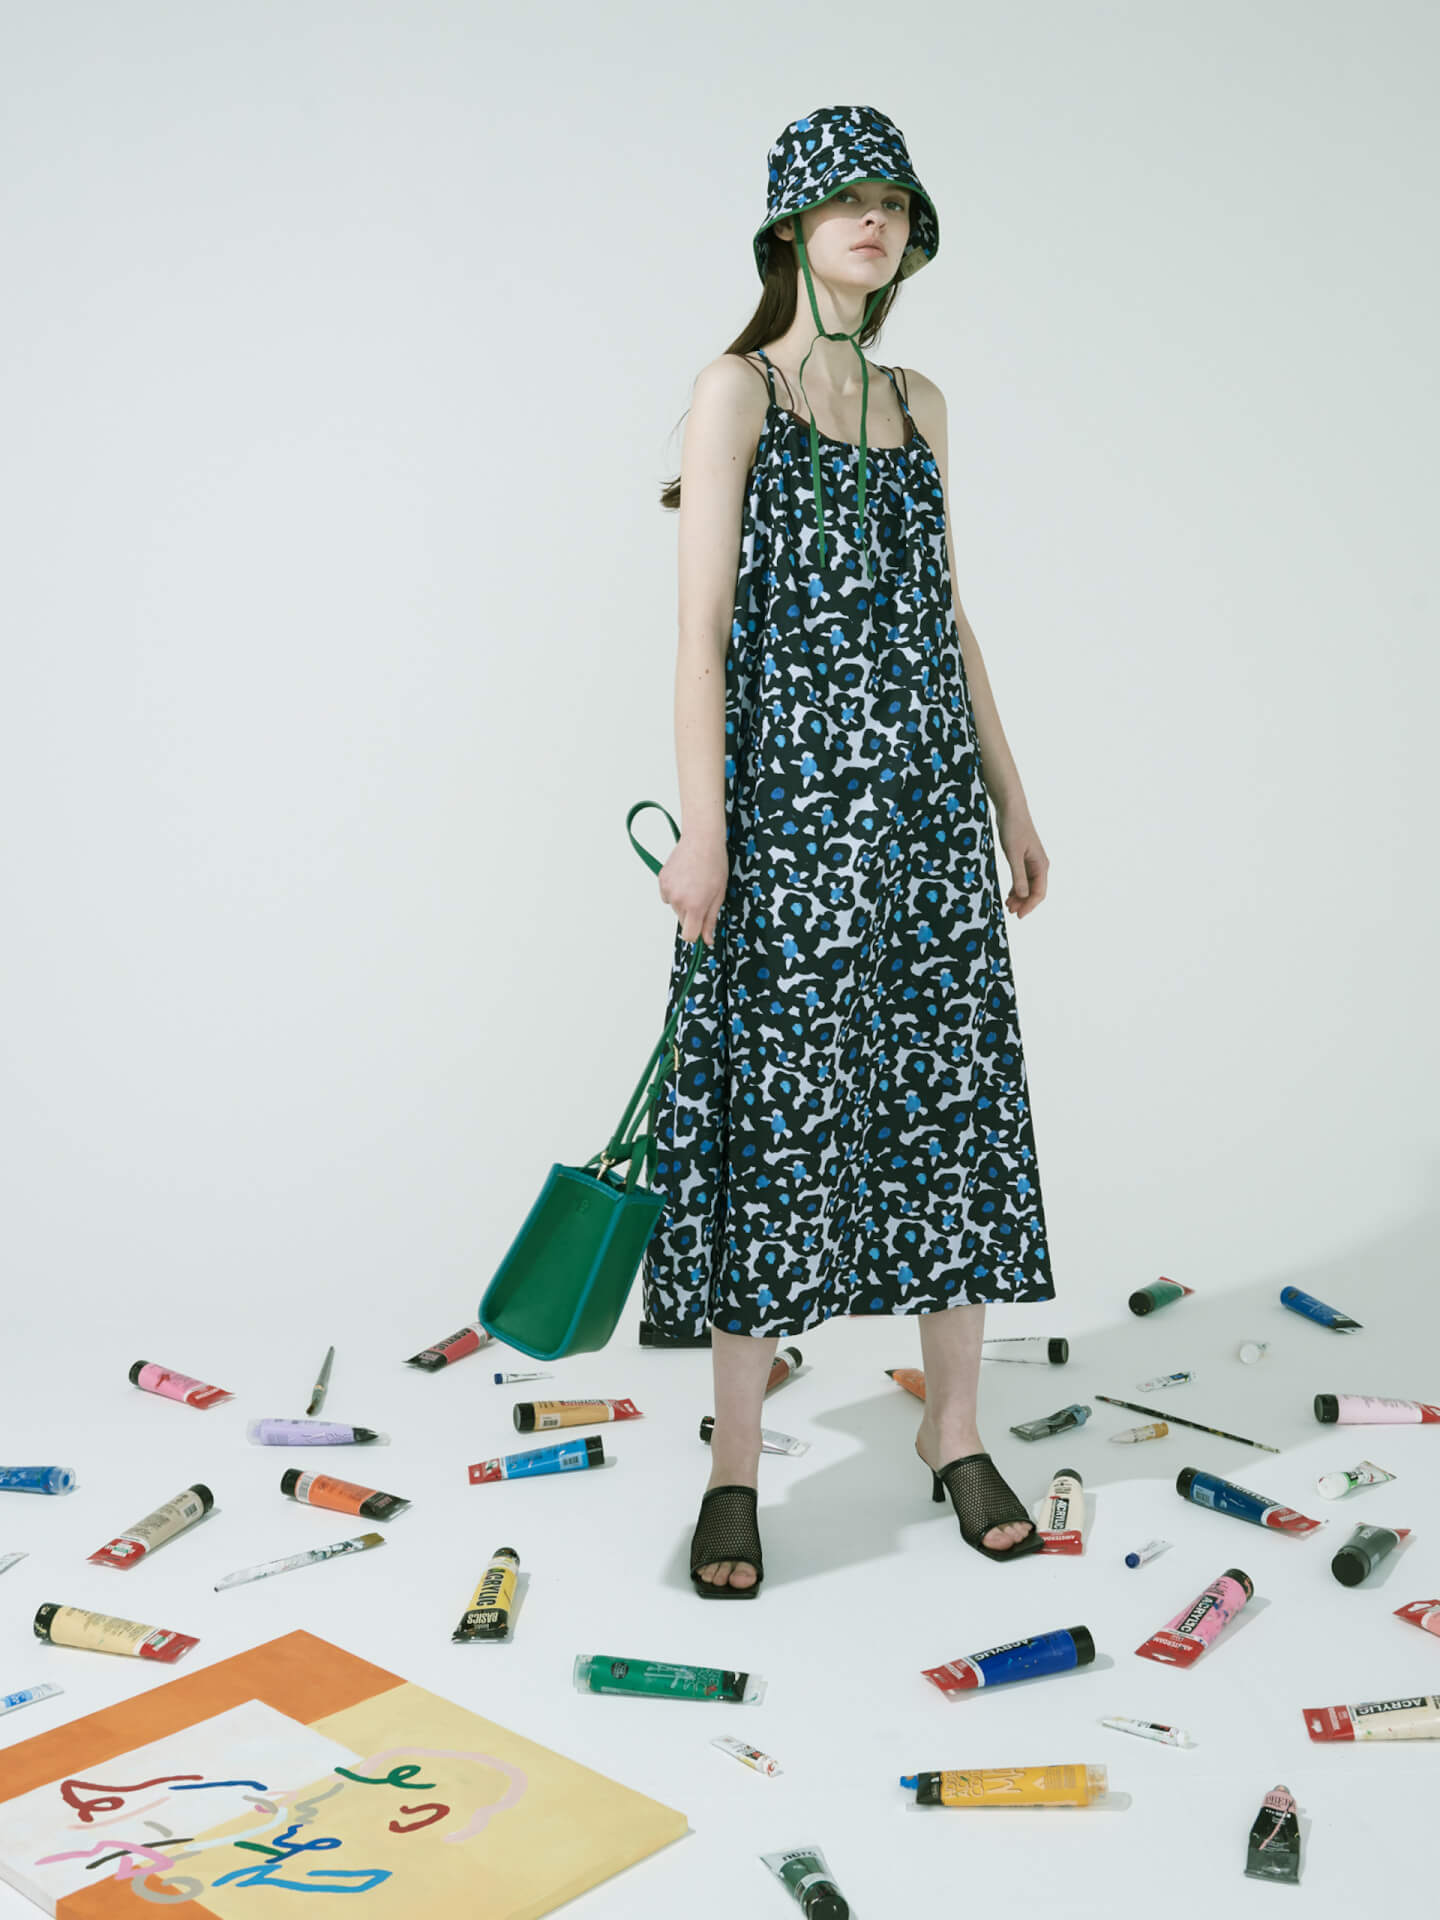 CHAIのベーシスト・YUUKIによるプロジェクト「YMYM」よりファッションブランドオープン!2021年春夏コレクション&描き下ろし絵画などの展示会も life210405_ymym_2